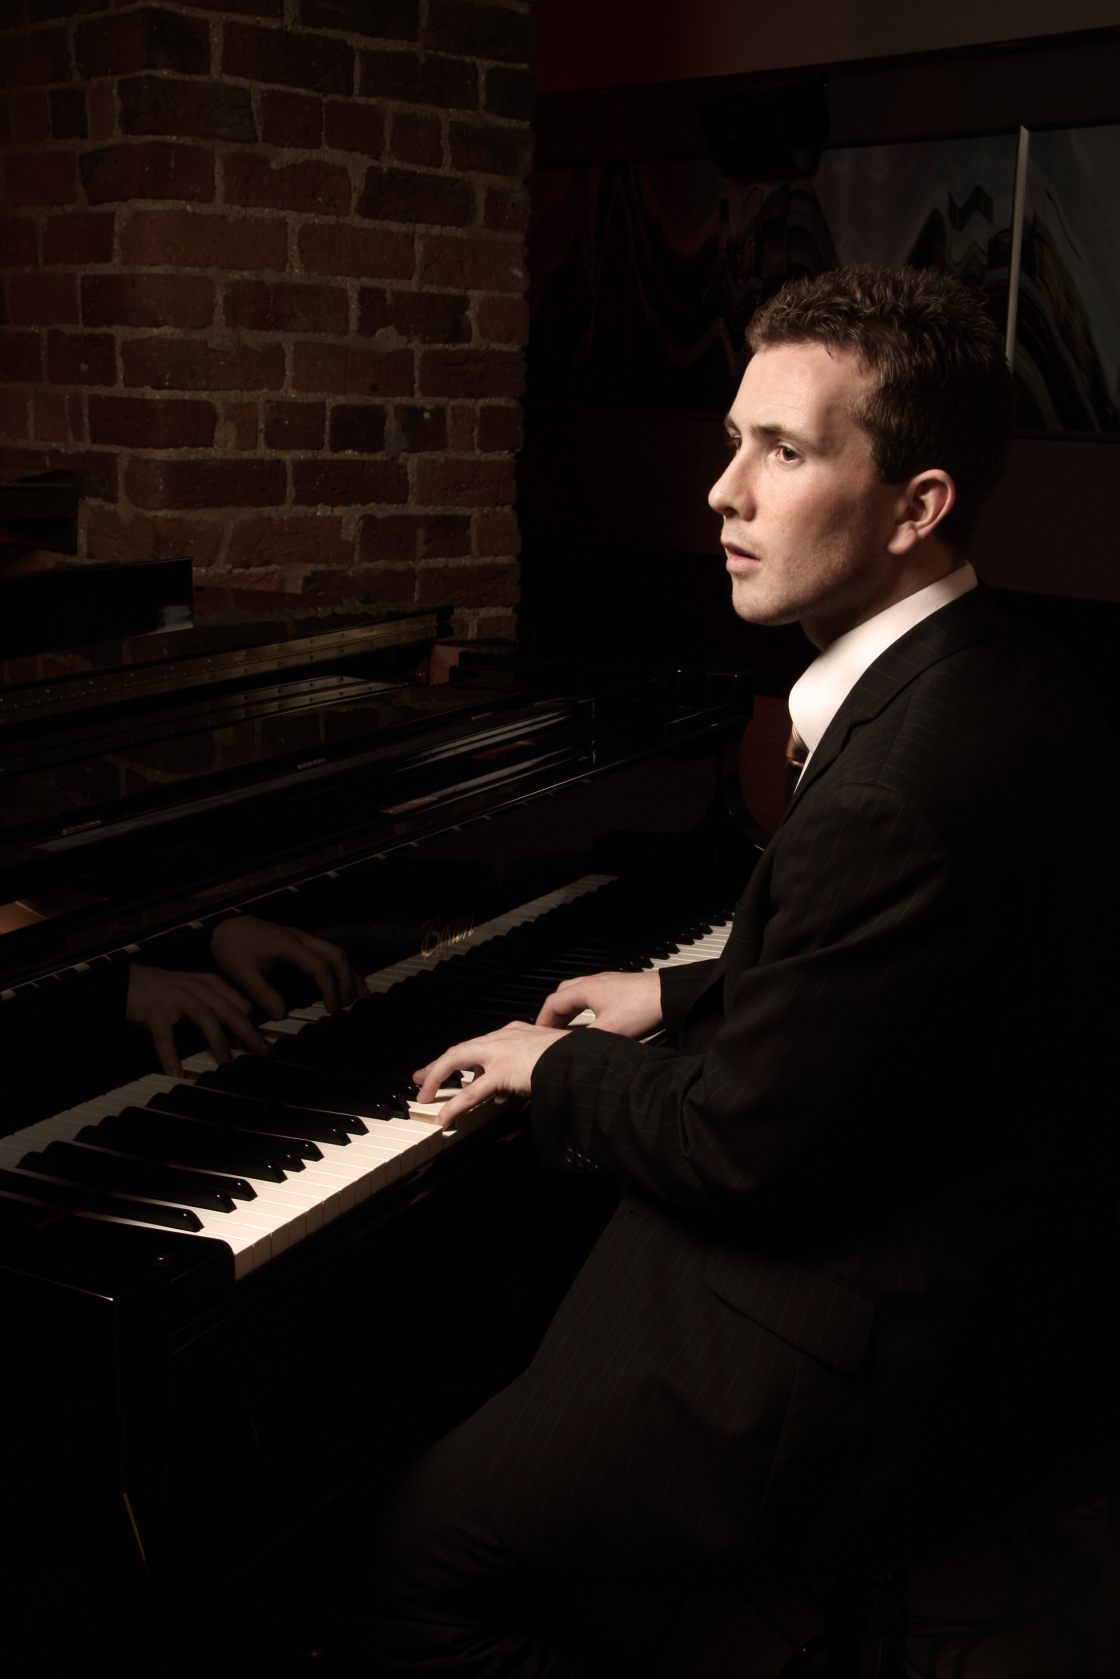 Joe Kenny Wedding Pianist playing on beautiful grand piano at wedding dinner